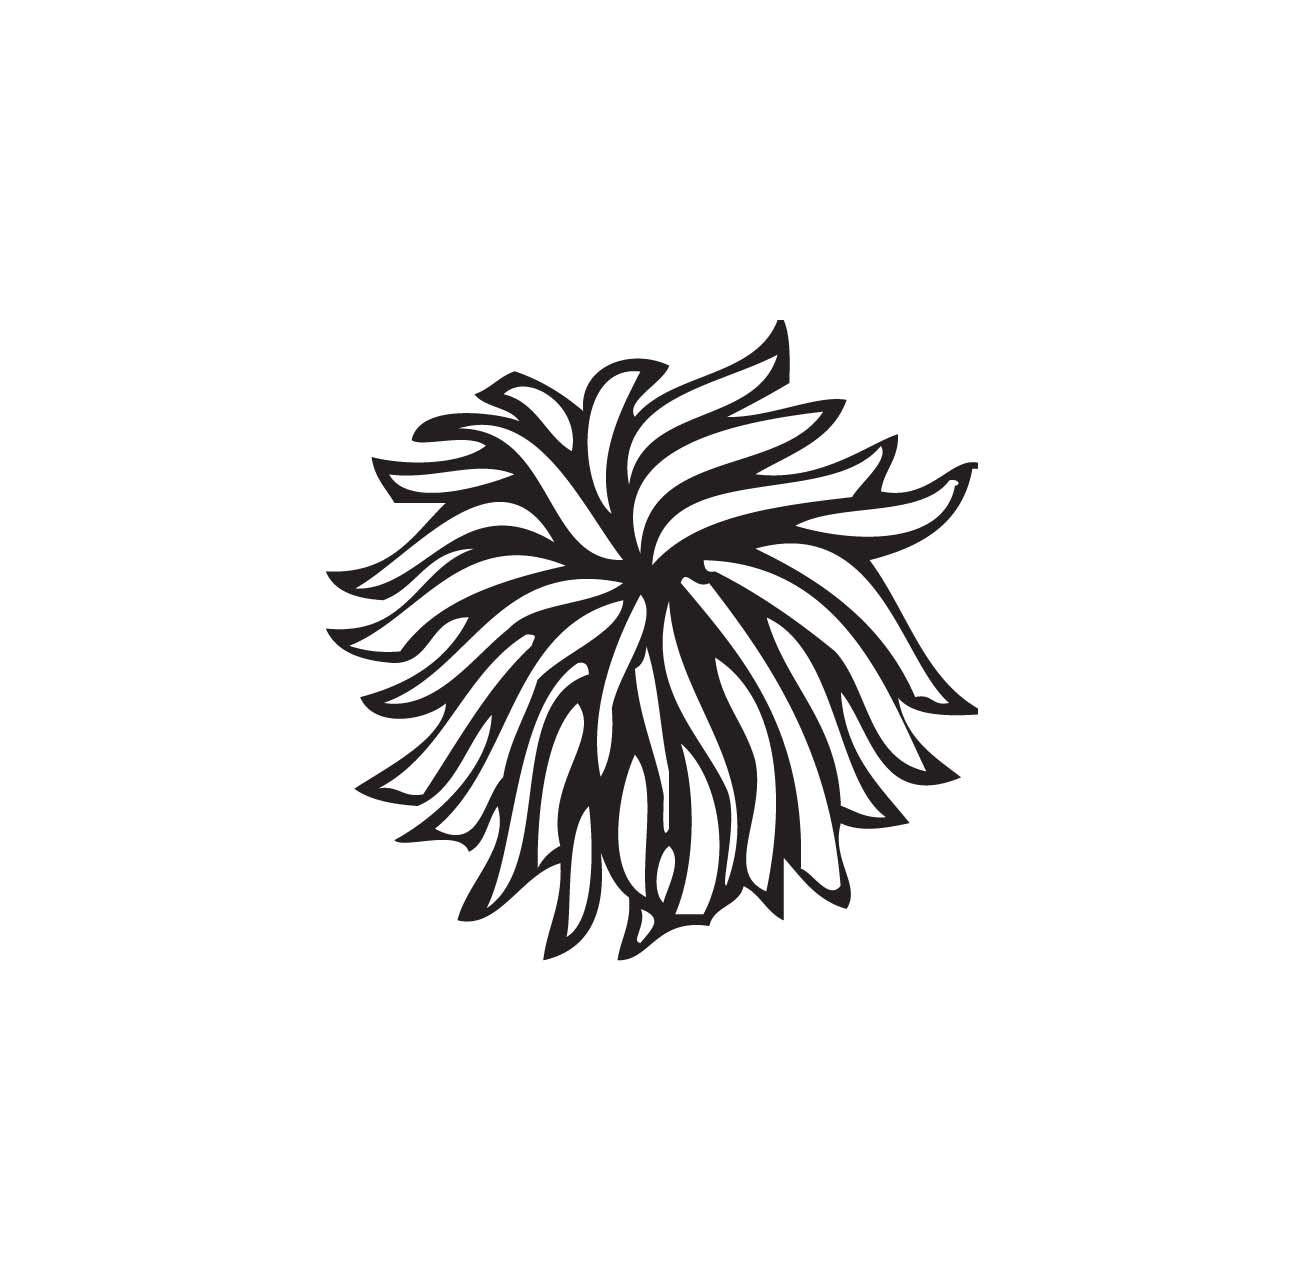 Cheerleader pom poms clipart black and white clip art library stock Pom Poms Clipart - ClipArt Best | Tshirt ideas | Instagram highlight ... clip art library stock